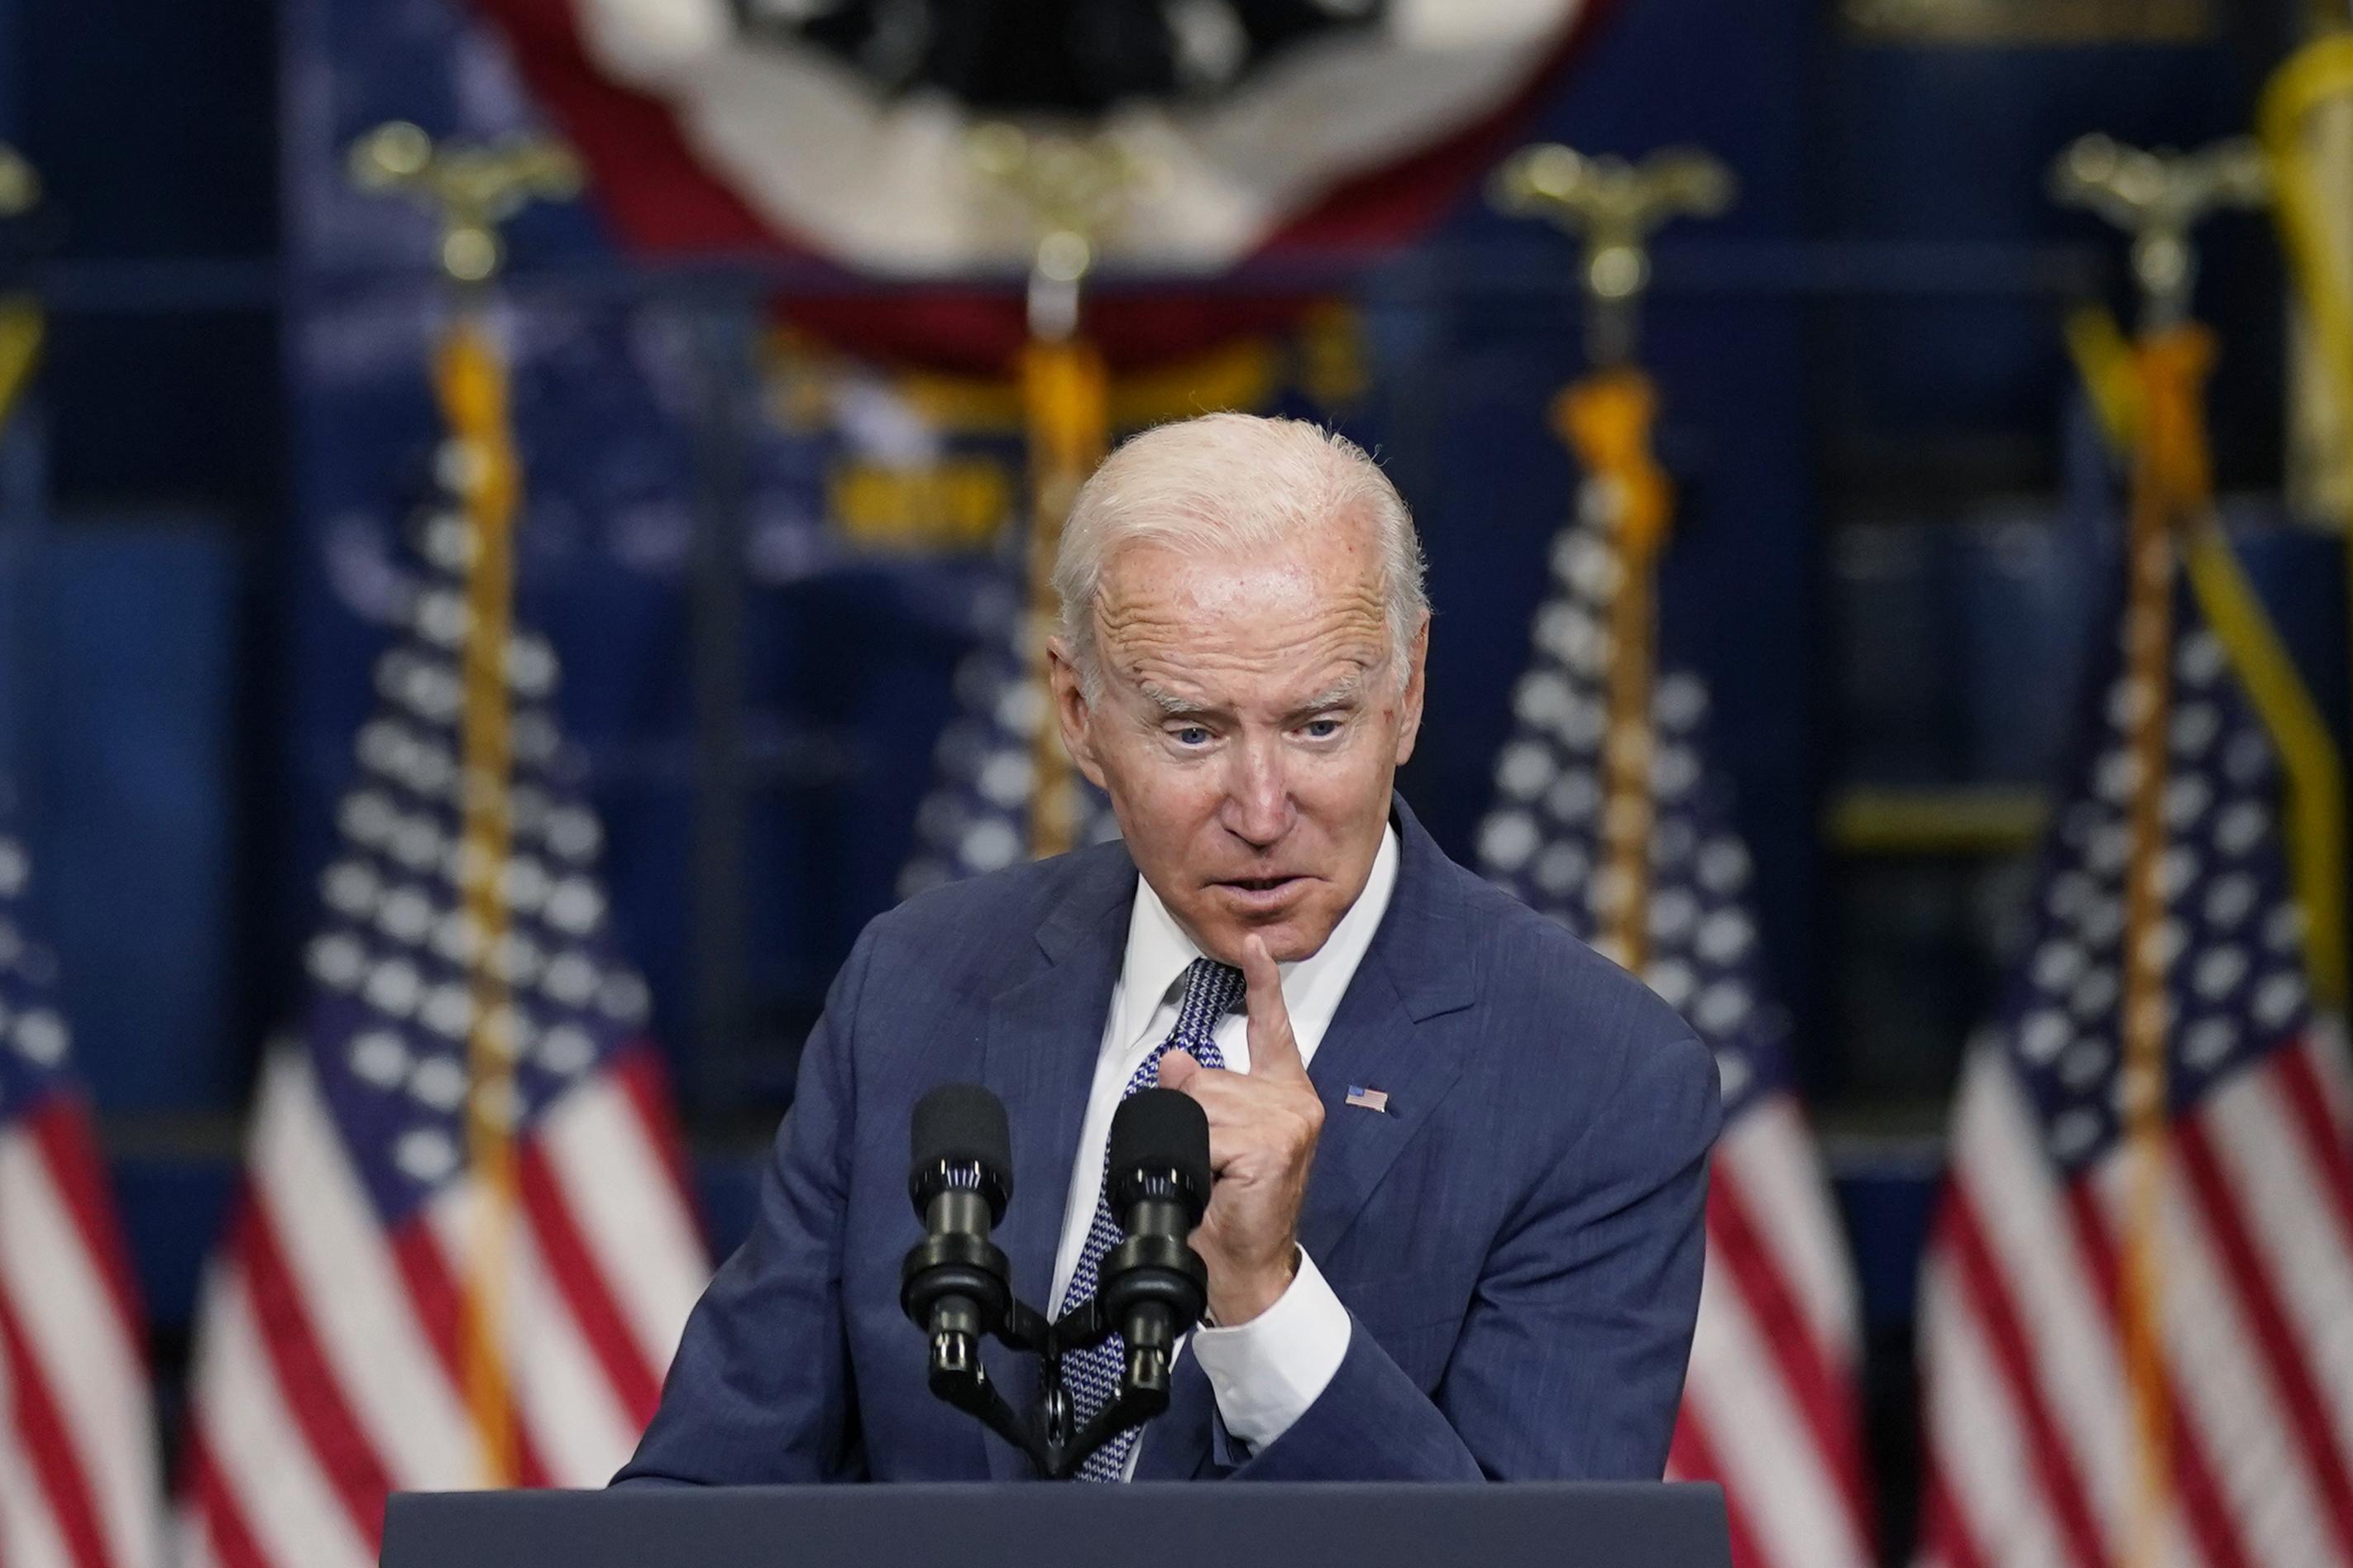 President Joe Biden delivers remarks at NJ Transit Meadowlands Maintenance Complex.